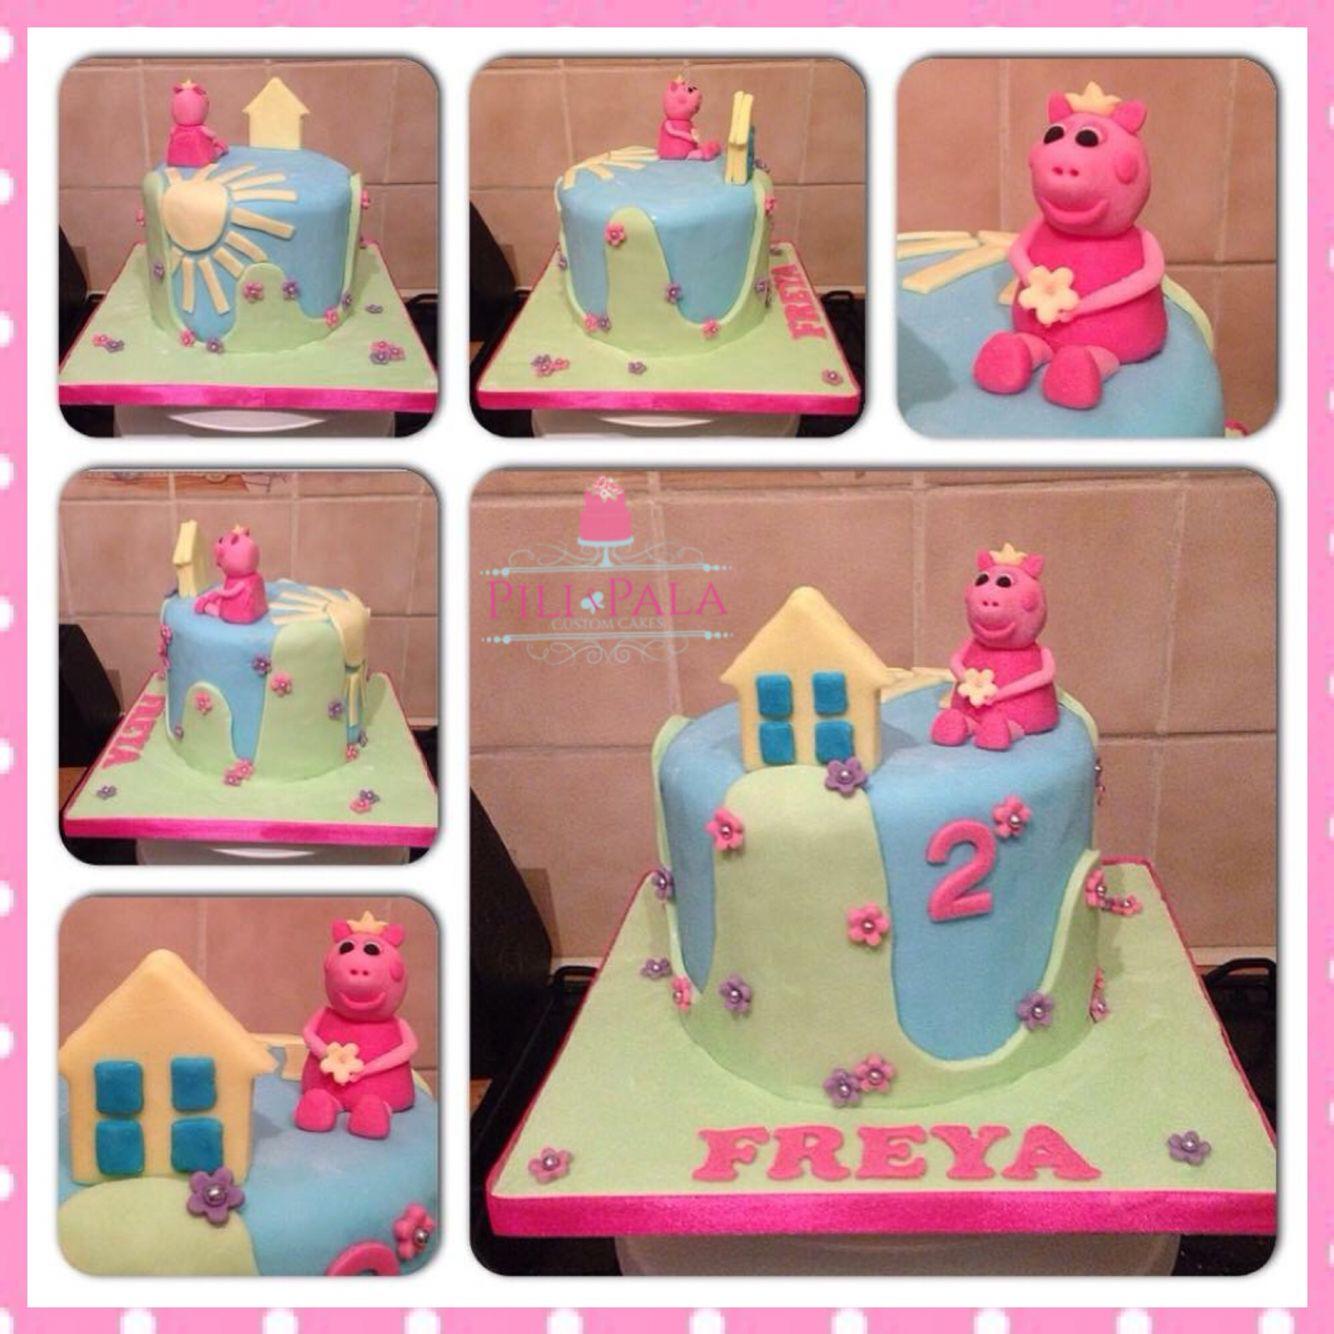 Girly peppa pig birthday cake peppa pig birthday cake